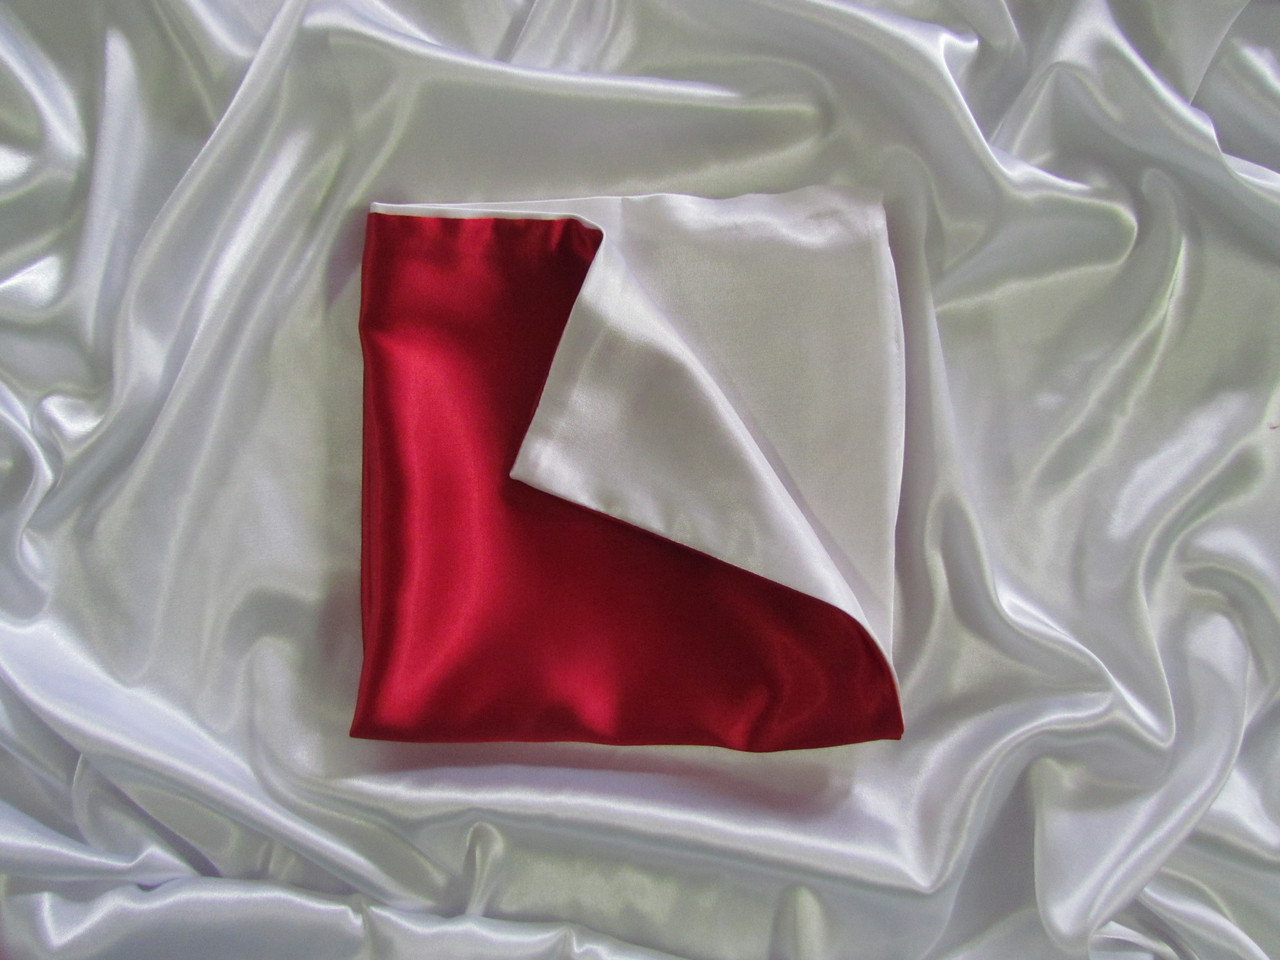 Наволочка двухцветная (бело-красная) для сублимации, 30х30 см, атлас